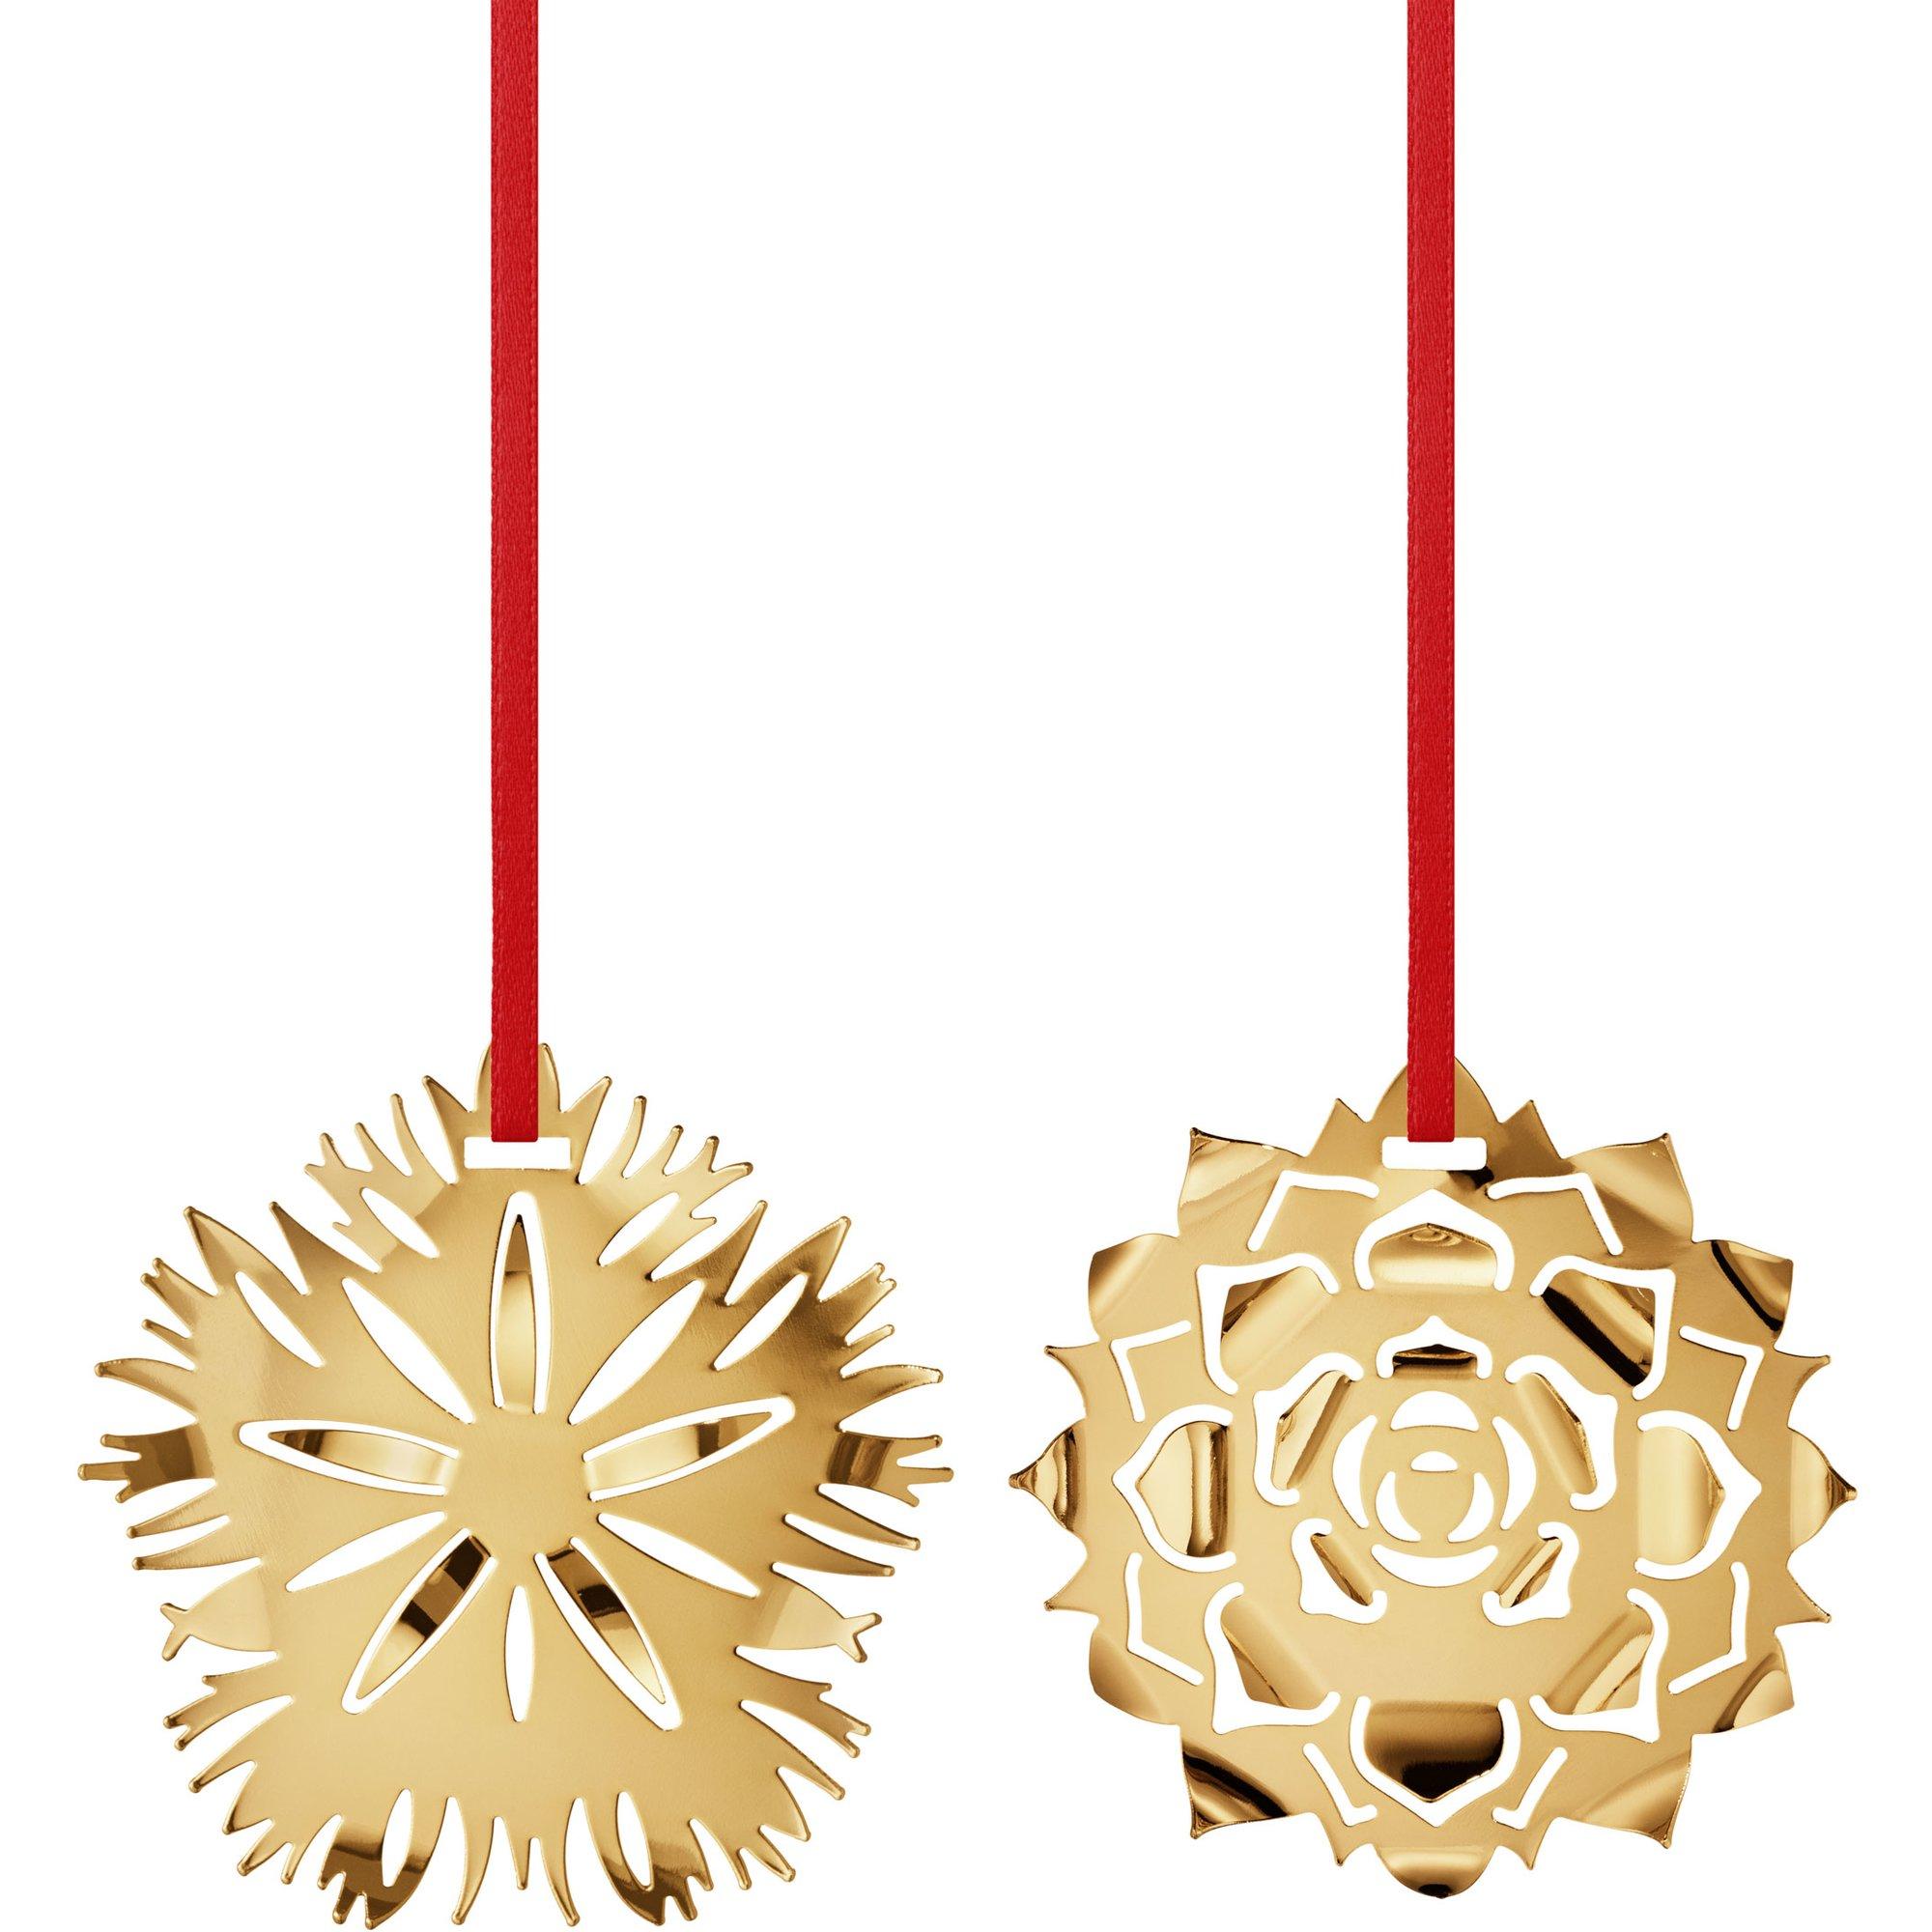 Georg Jensen 2020 Ornament Ice & Ice Rosette